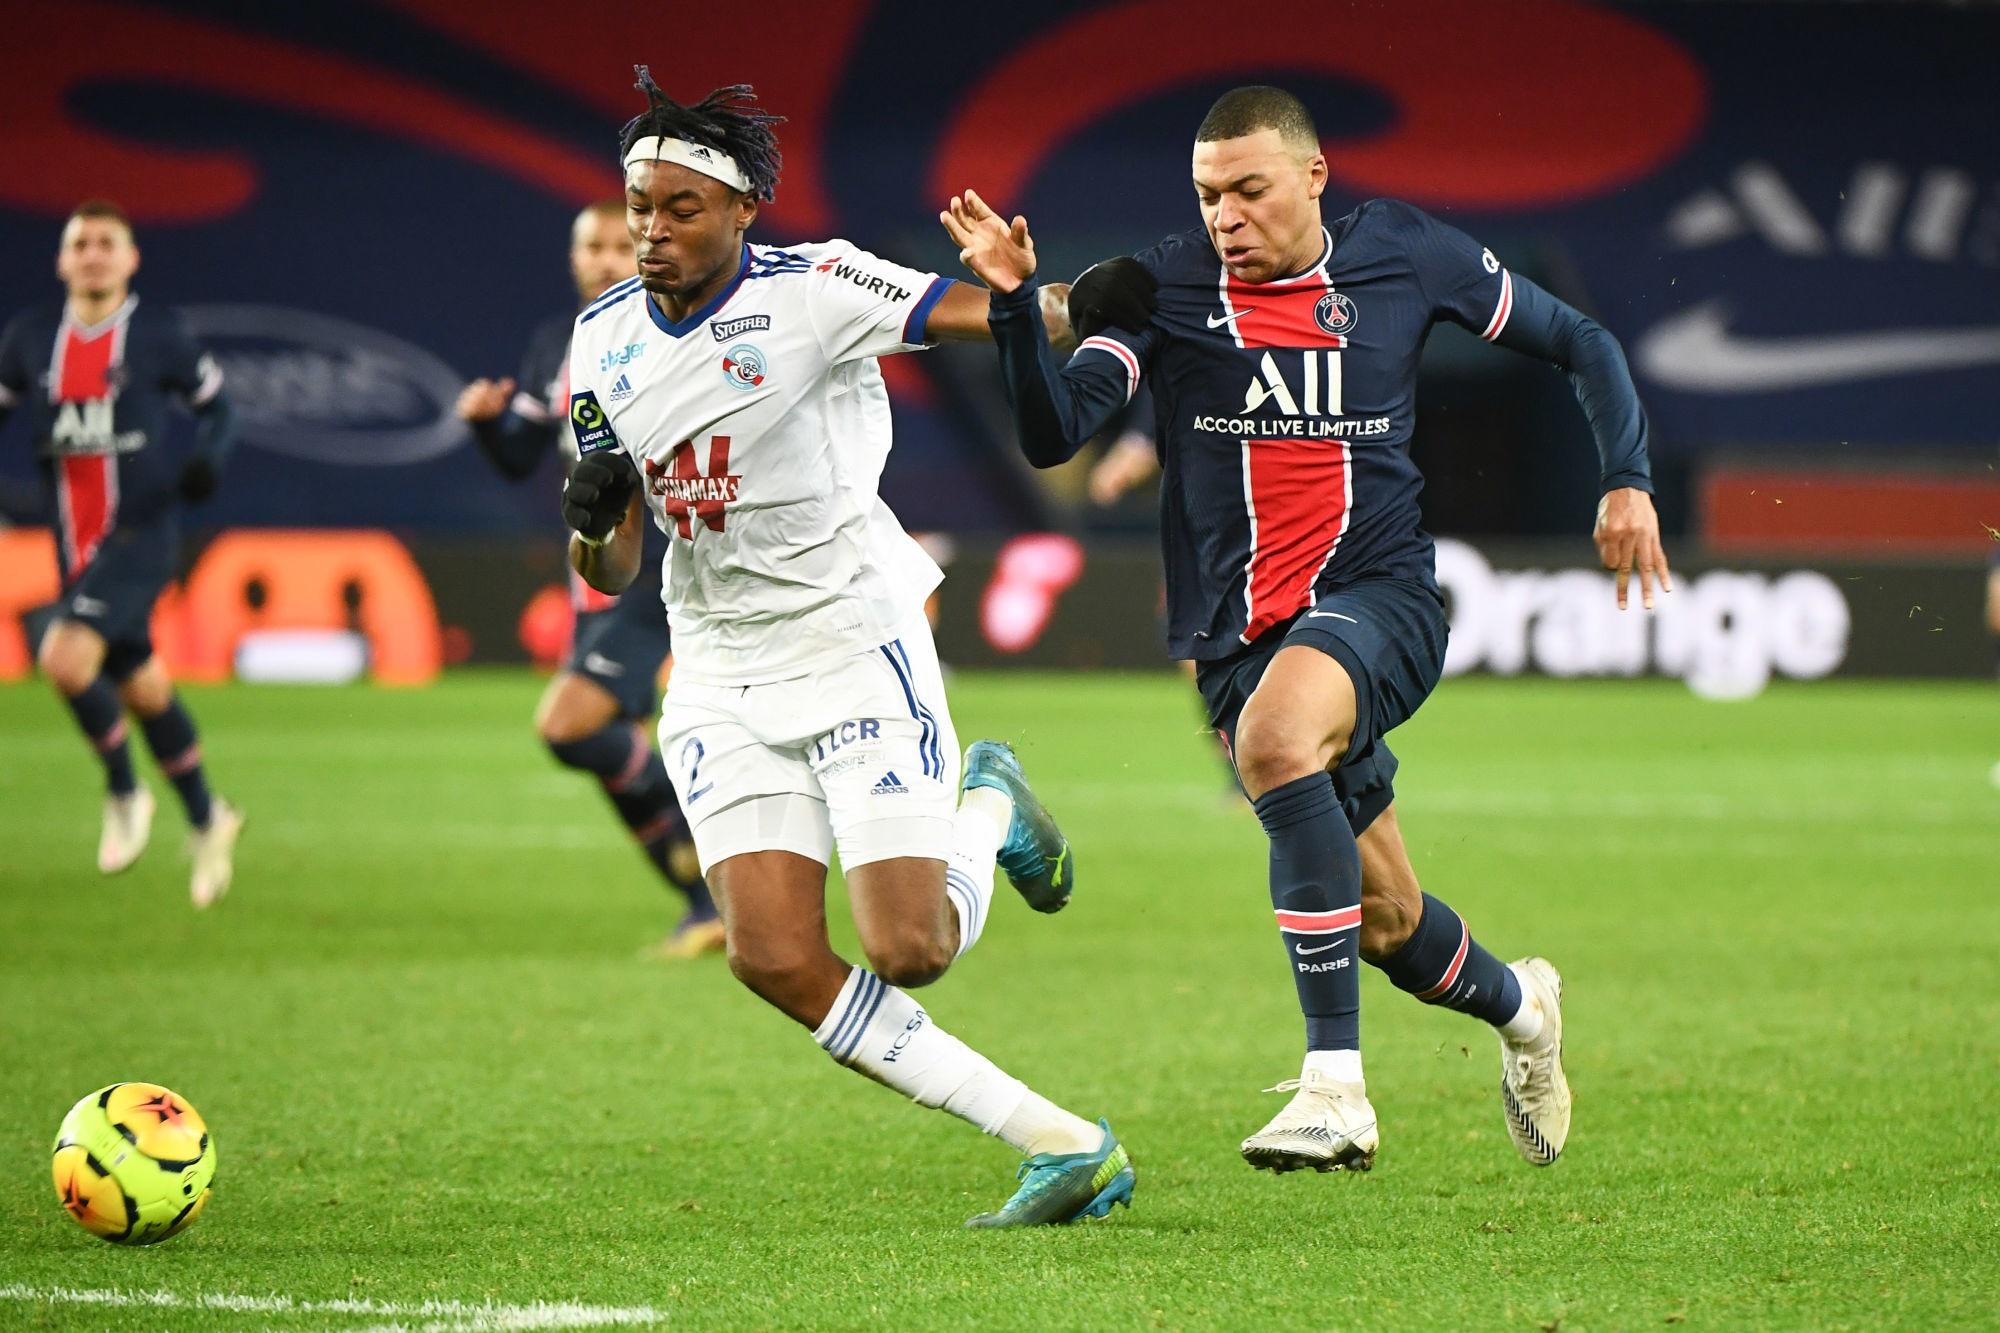 "PSG/Strasbourg - Simakan évoque un match ""un peu honteux"""